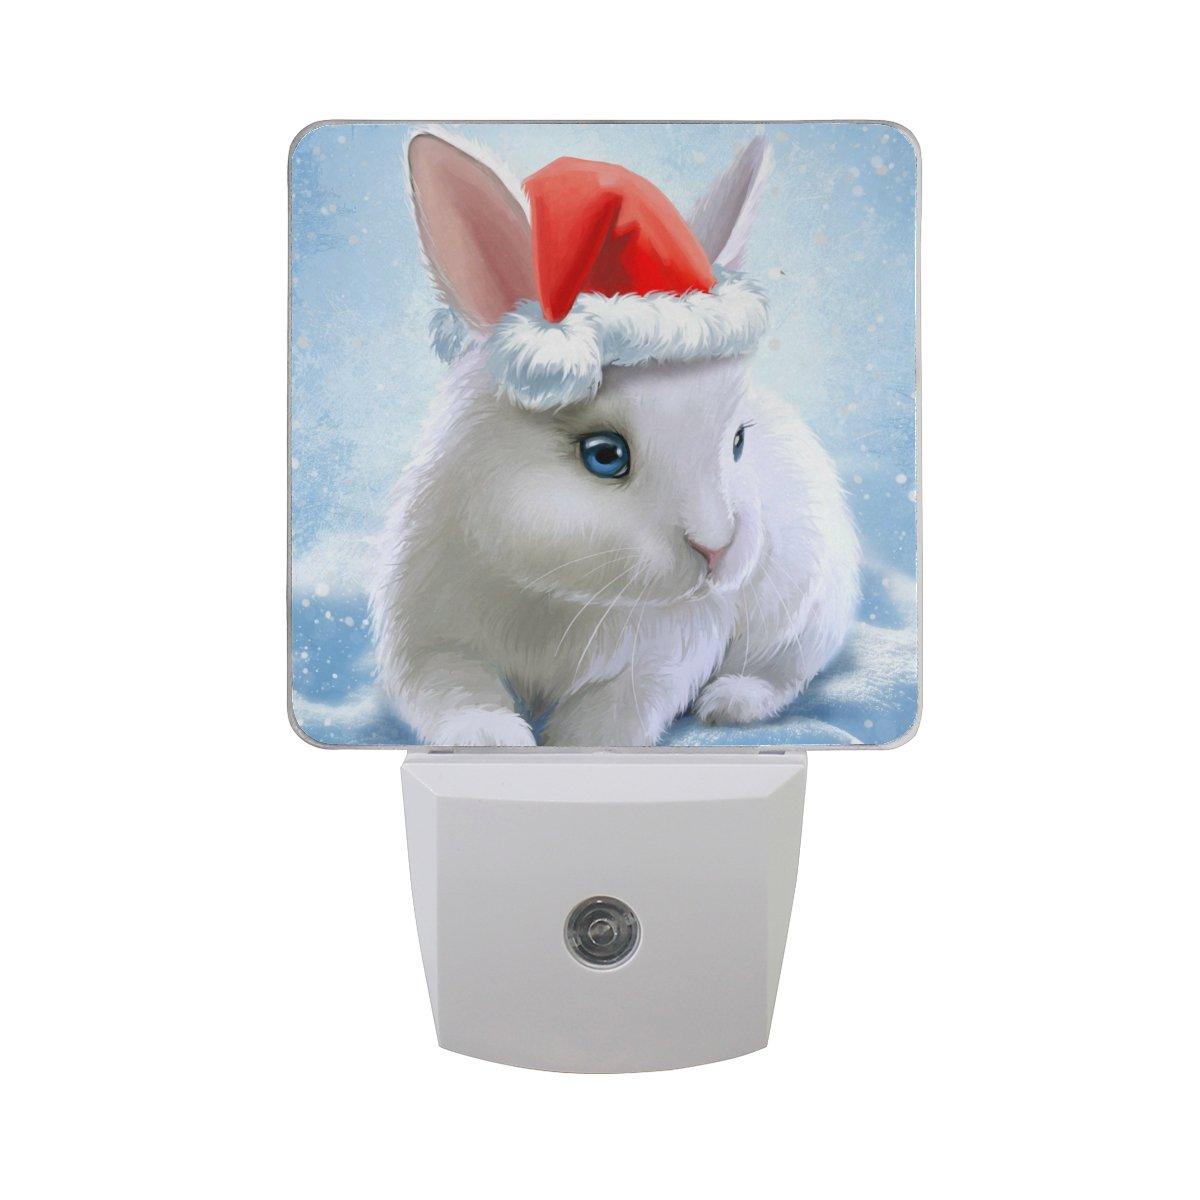 JOYPRINT Led Night Light Cute Animal Rabbit Bunny, Auto Senor Dusk to Dawn Night Light Plug in for Kids Baby Girls Boys Adults Room